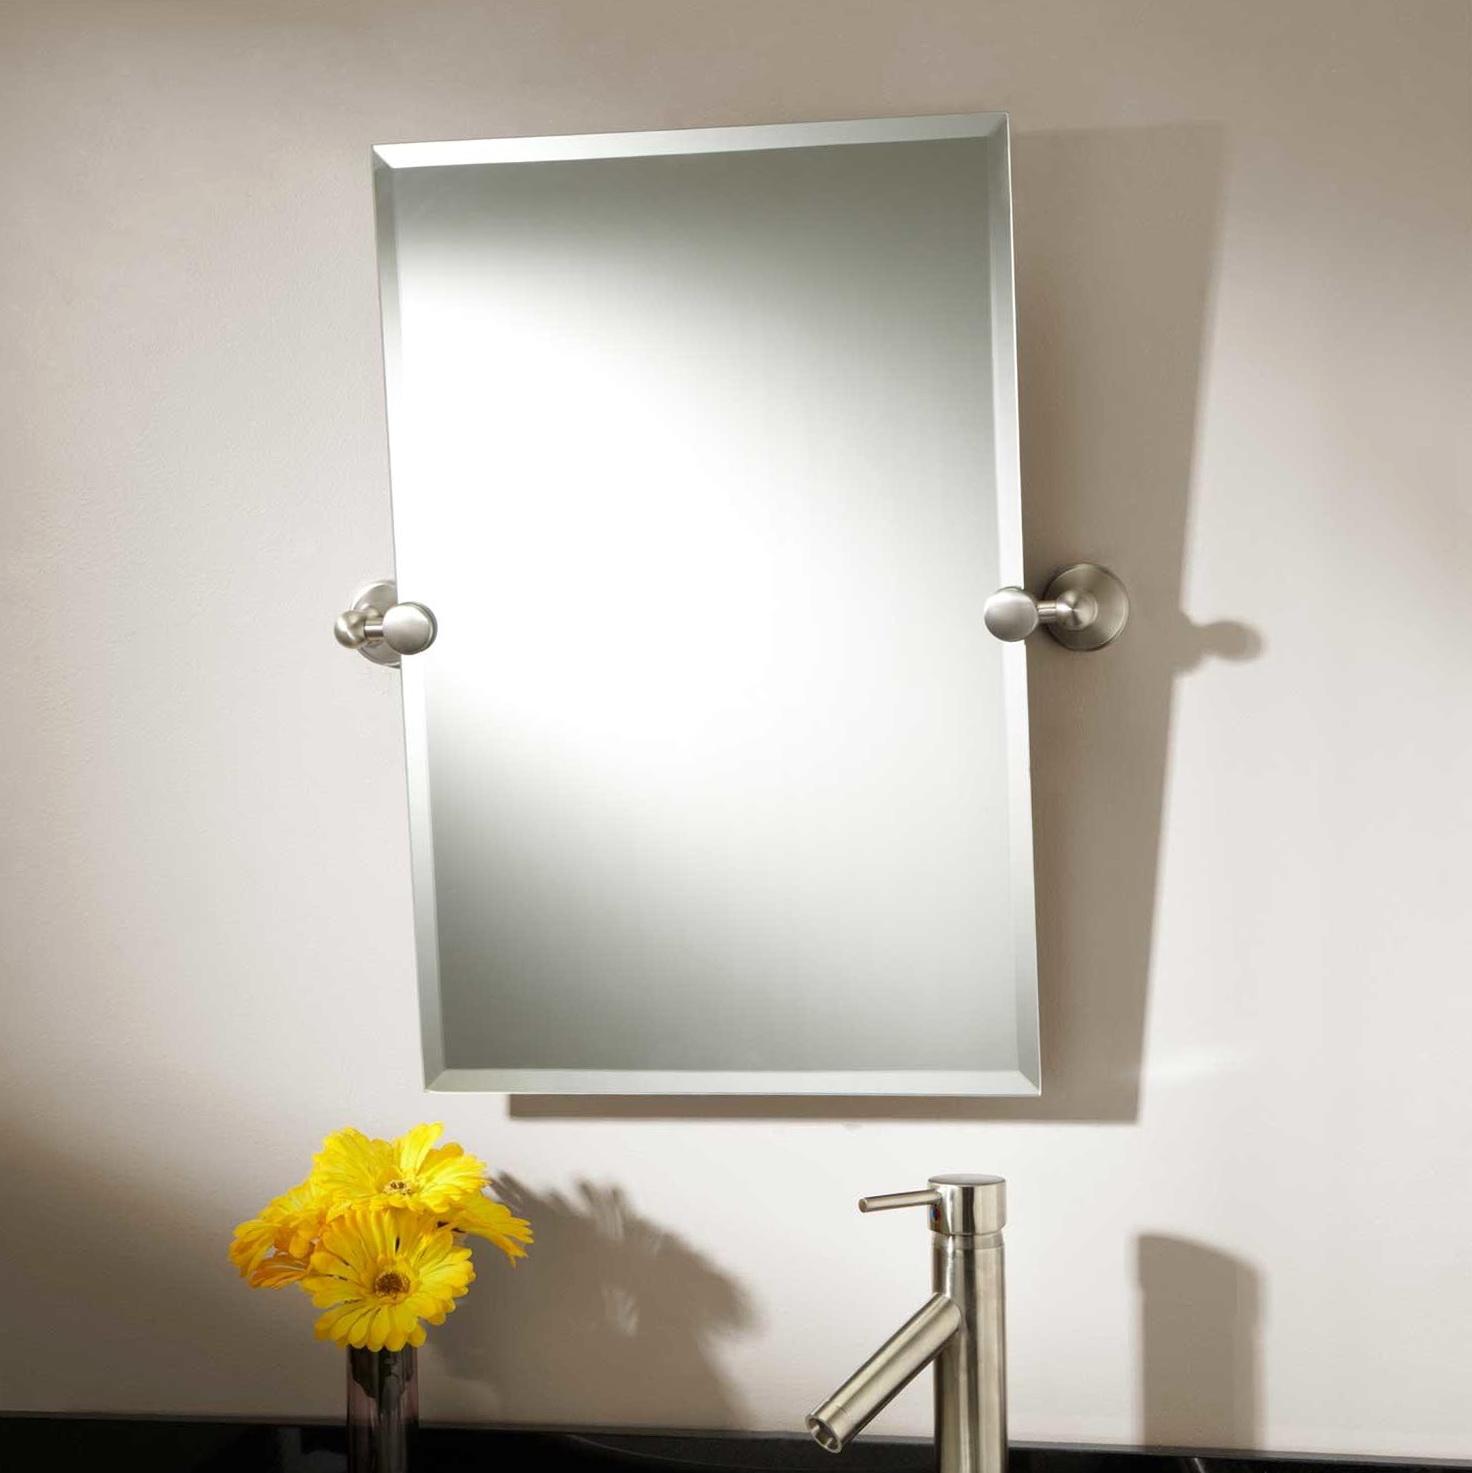 Tilt Mirror Mounting Hardware